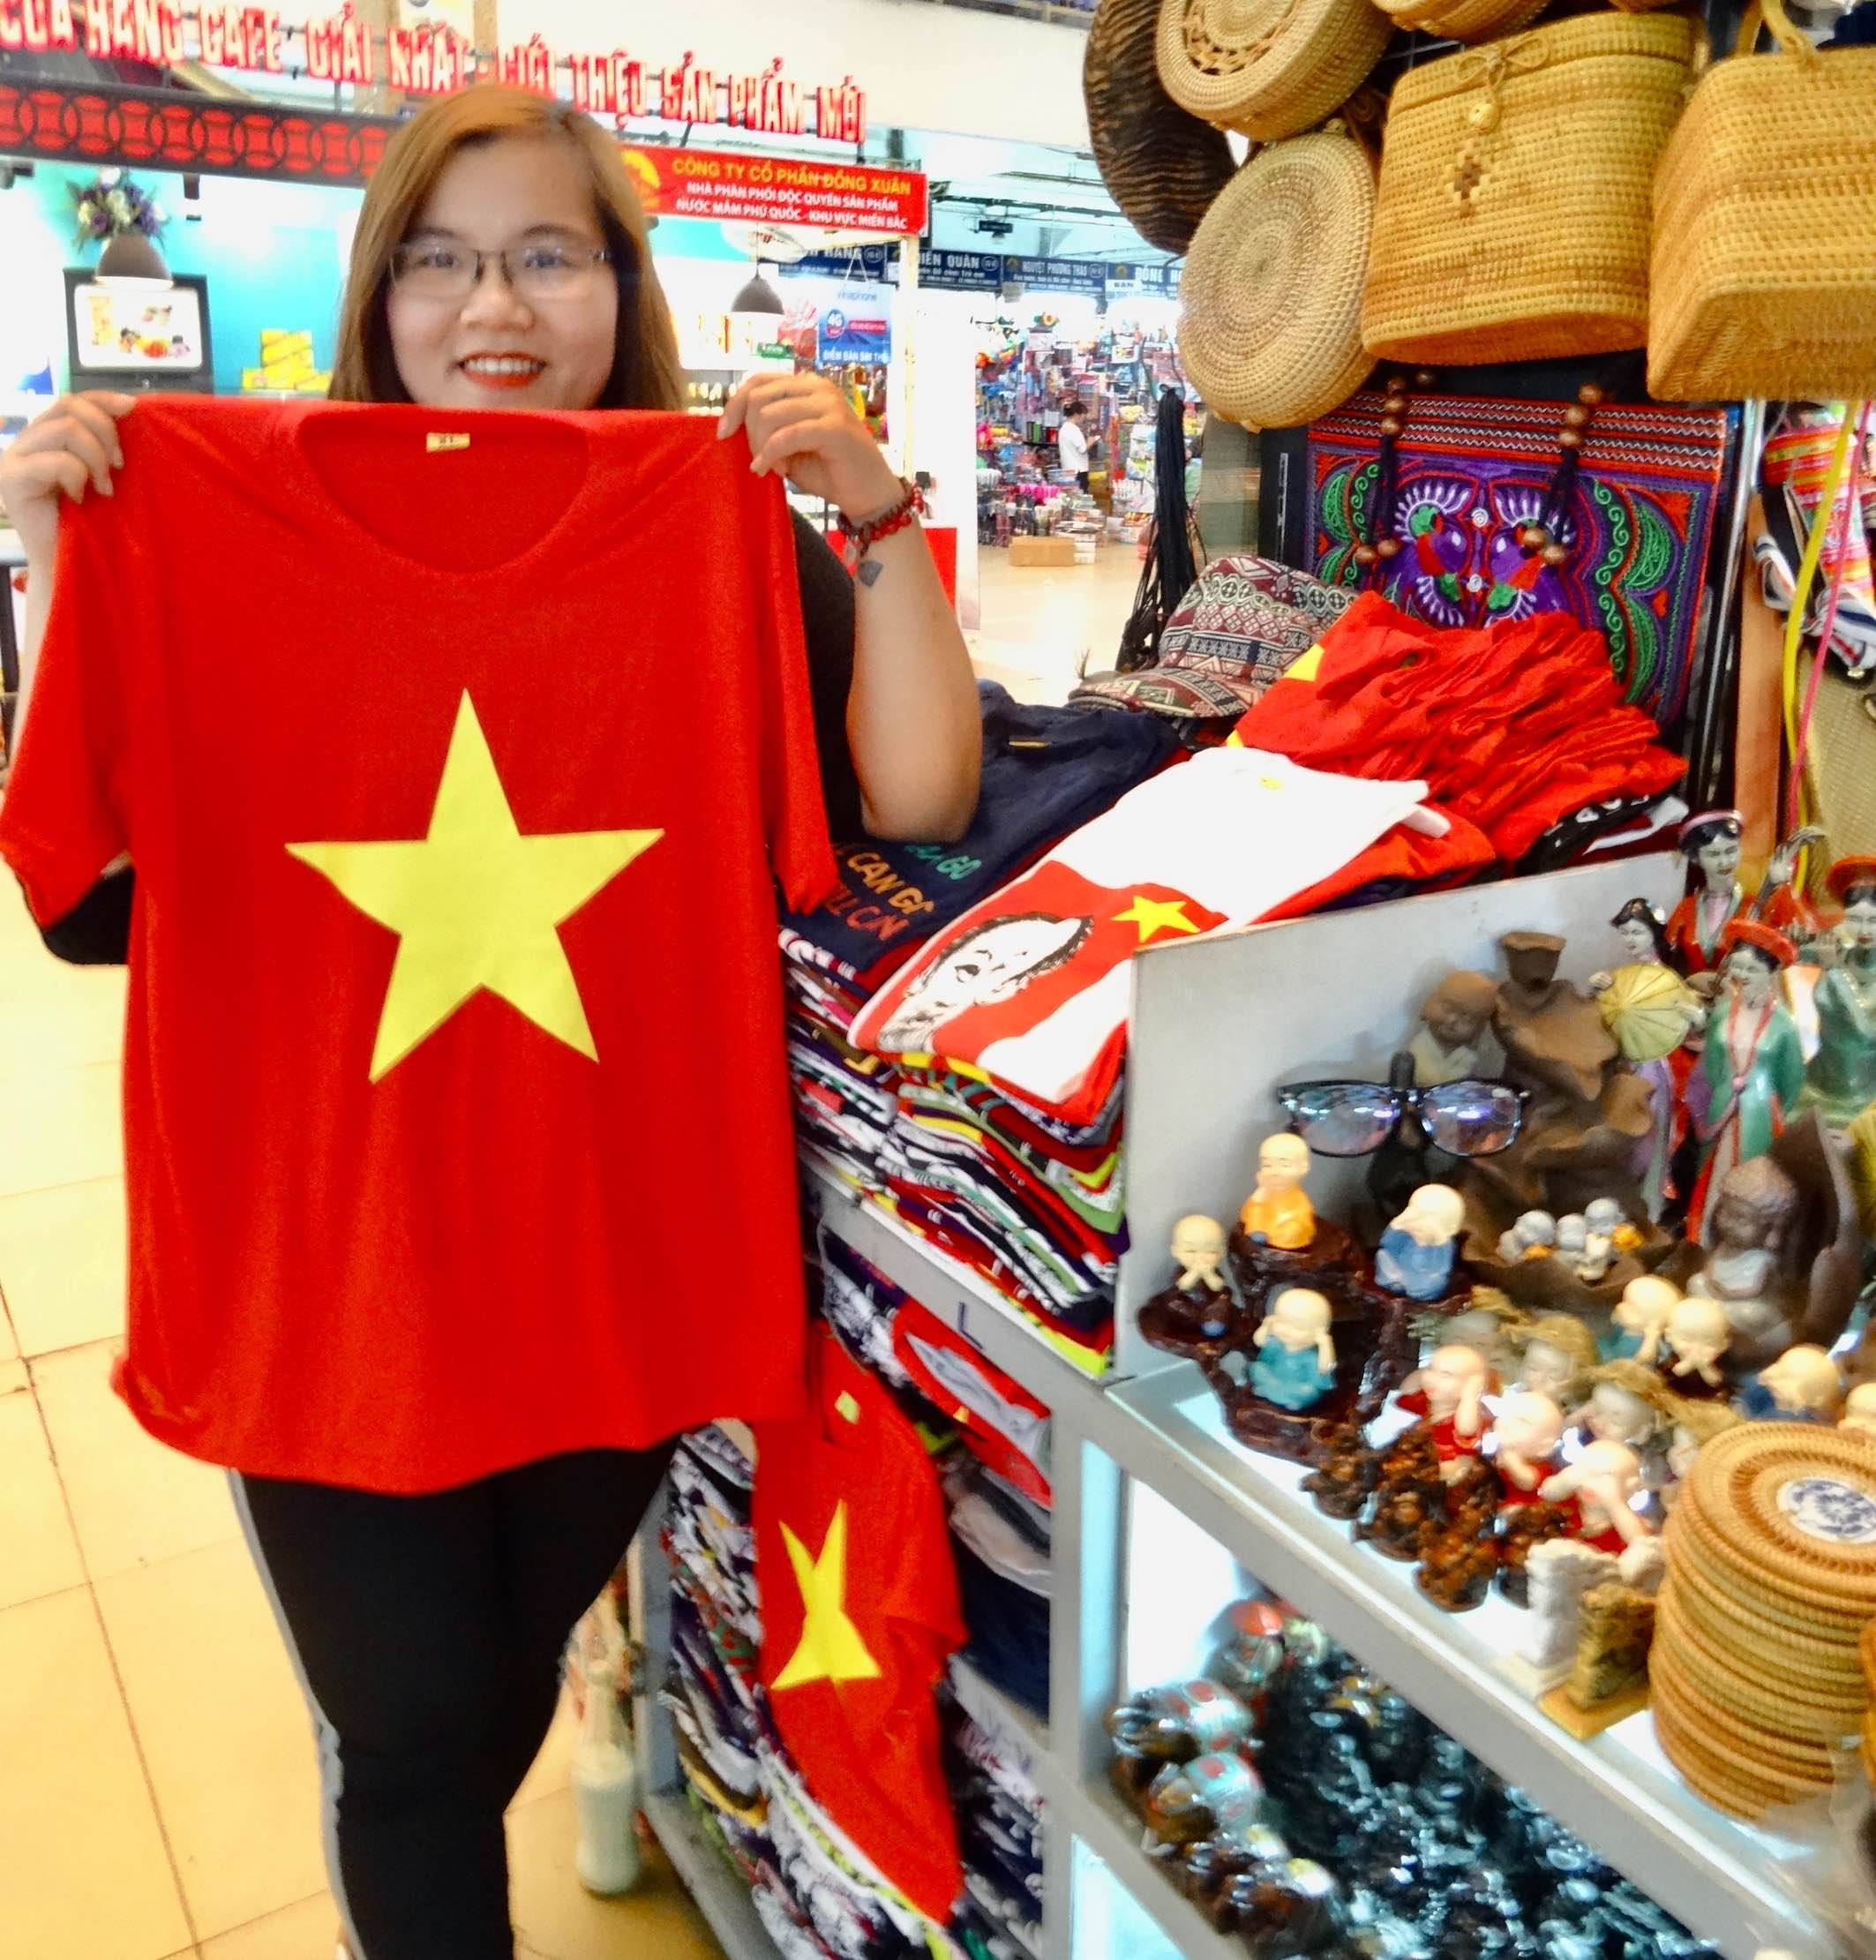 T-shirt vendor Dong Xuan Market